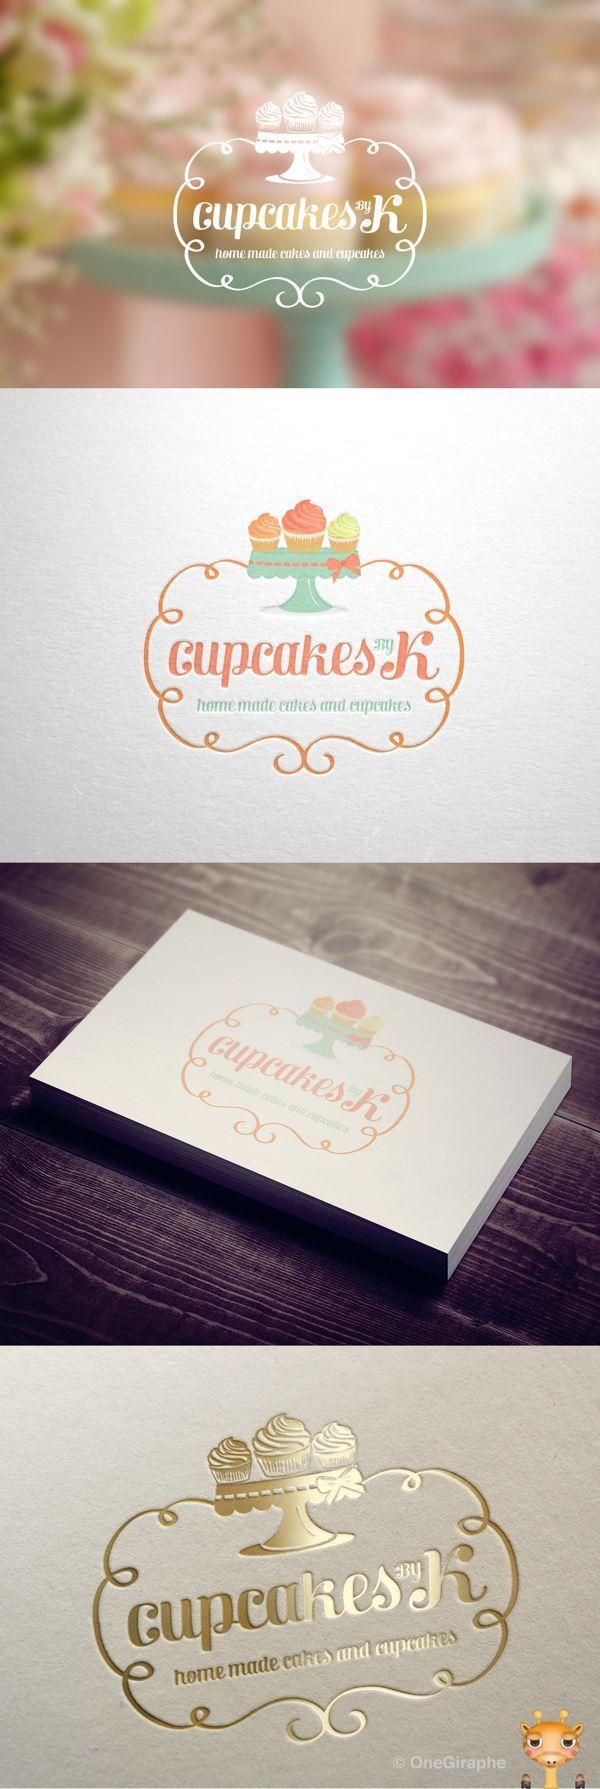 Cupcakes by K - Logo for Sale! by OneGiraphe , via Behance ...